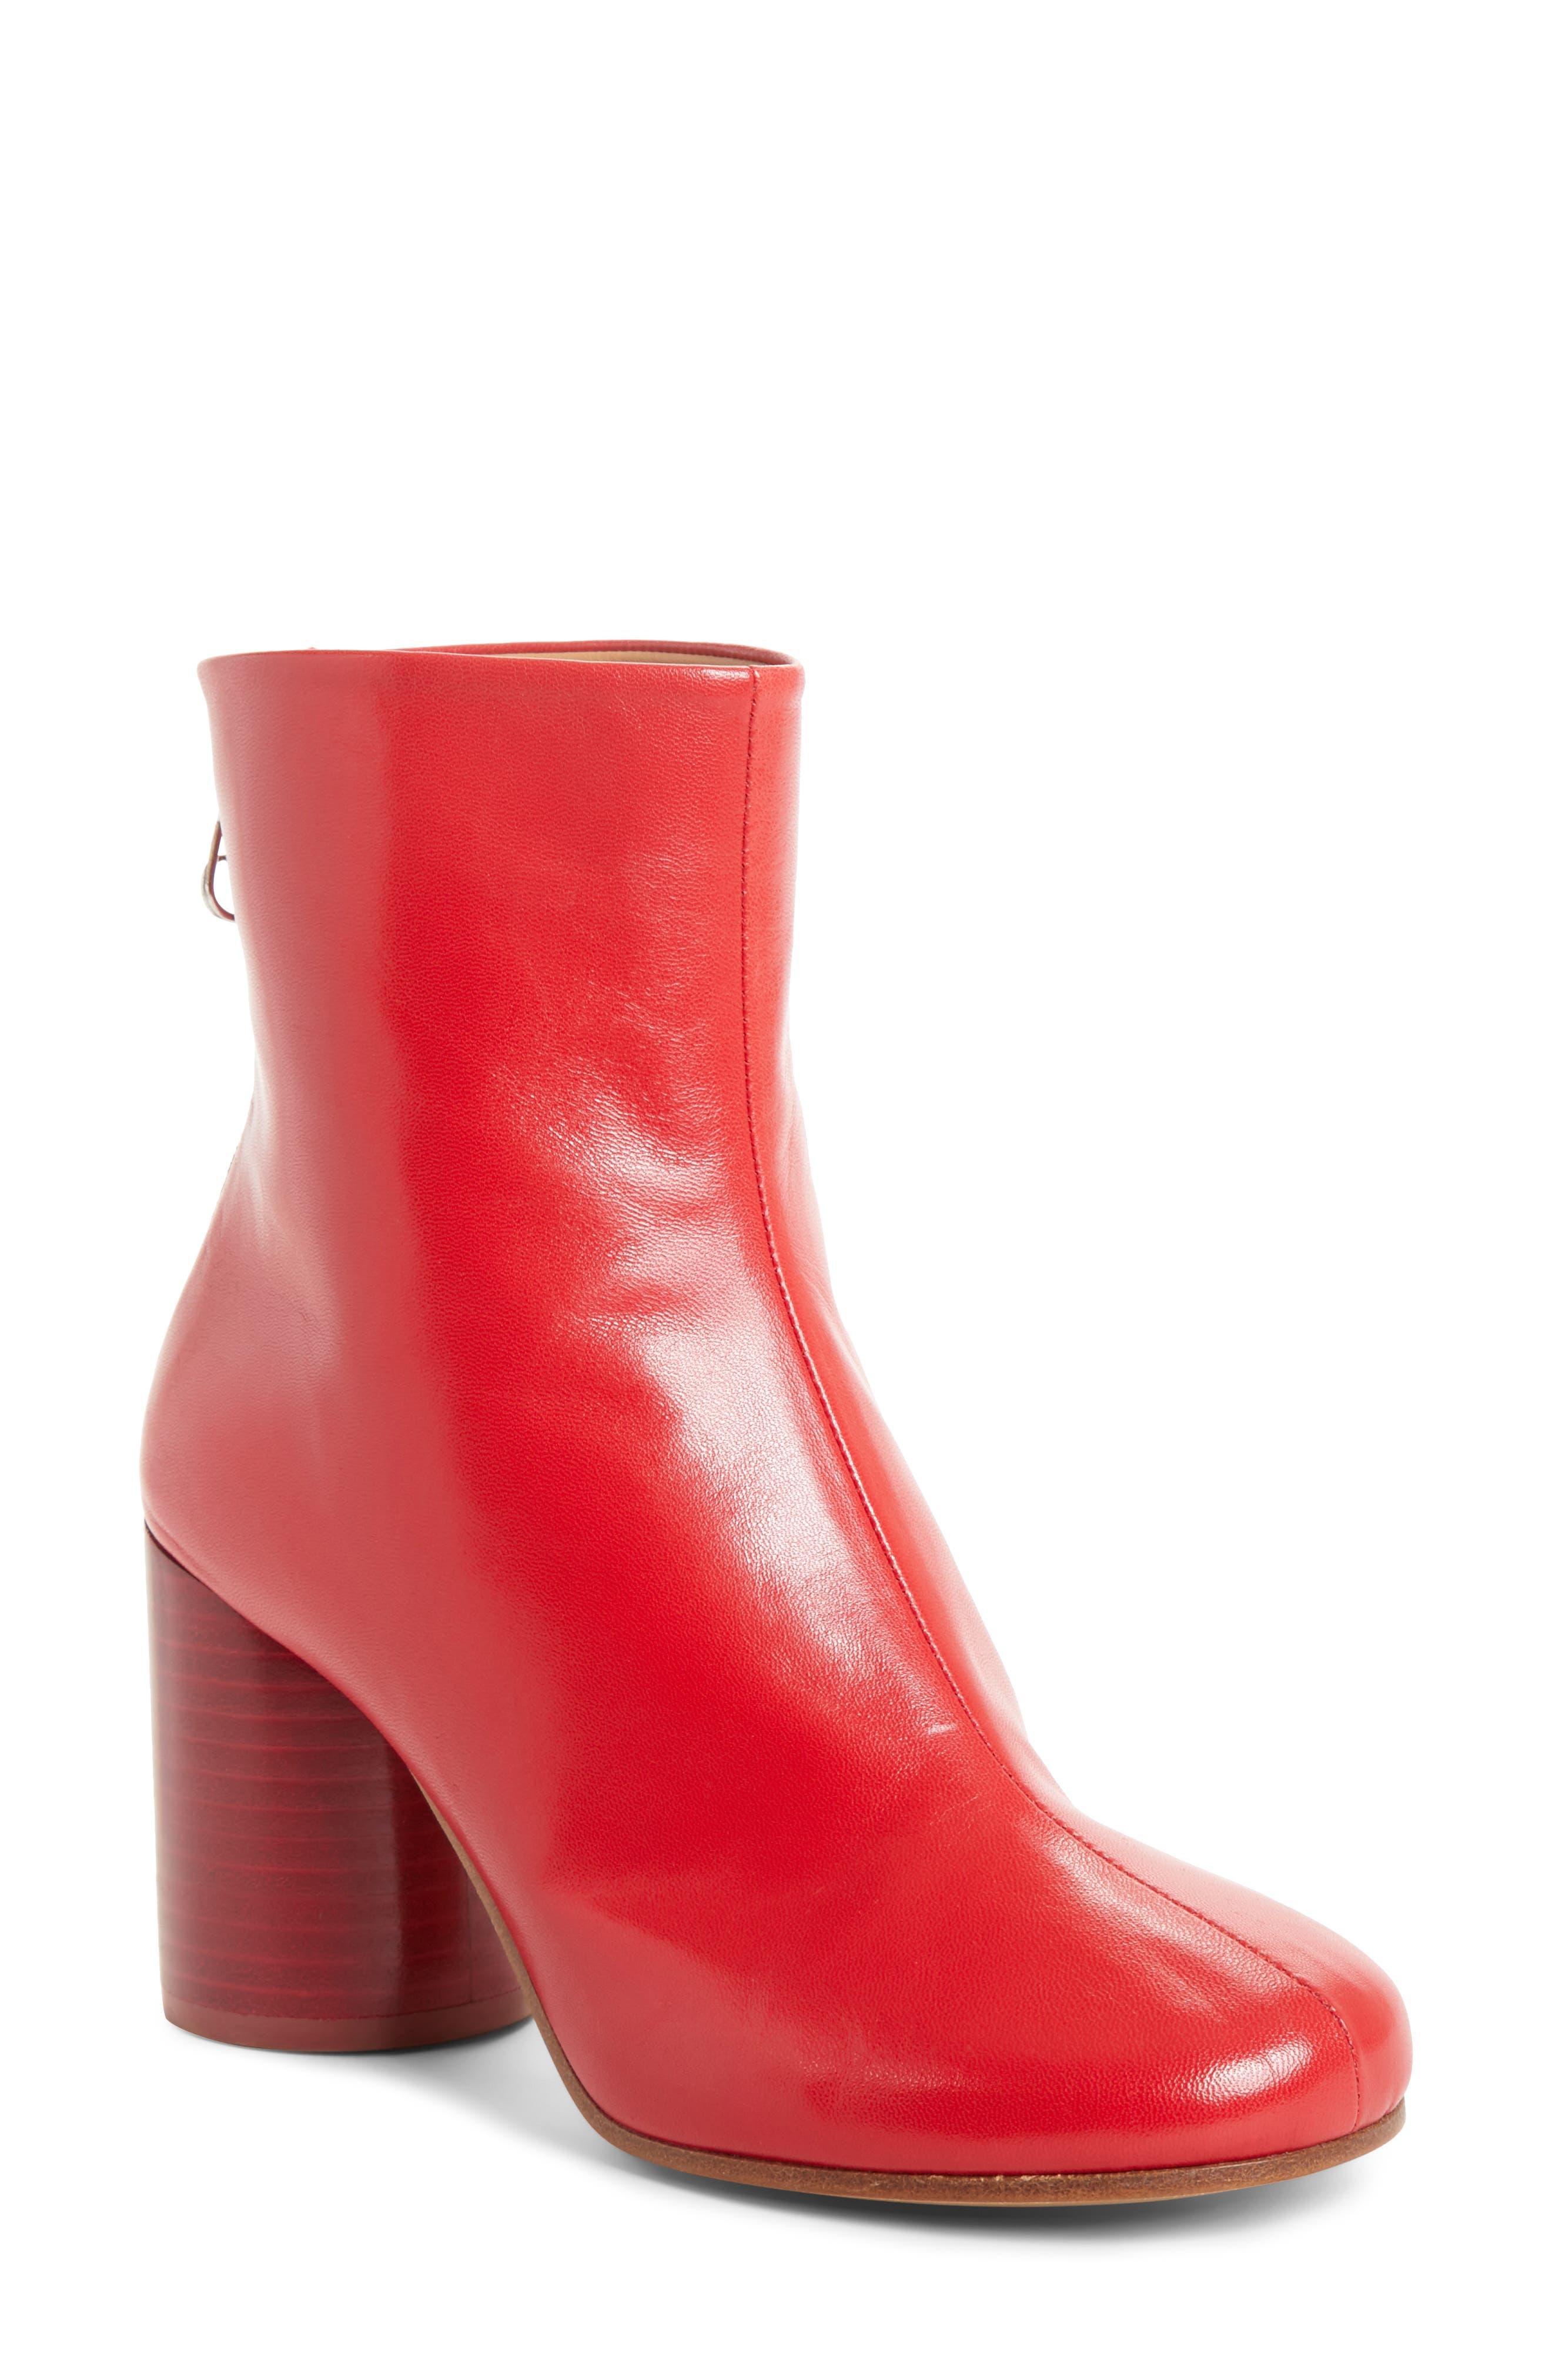 Maison Margiela Round Heel Ankle Boot (Women)